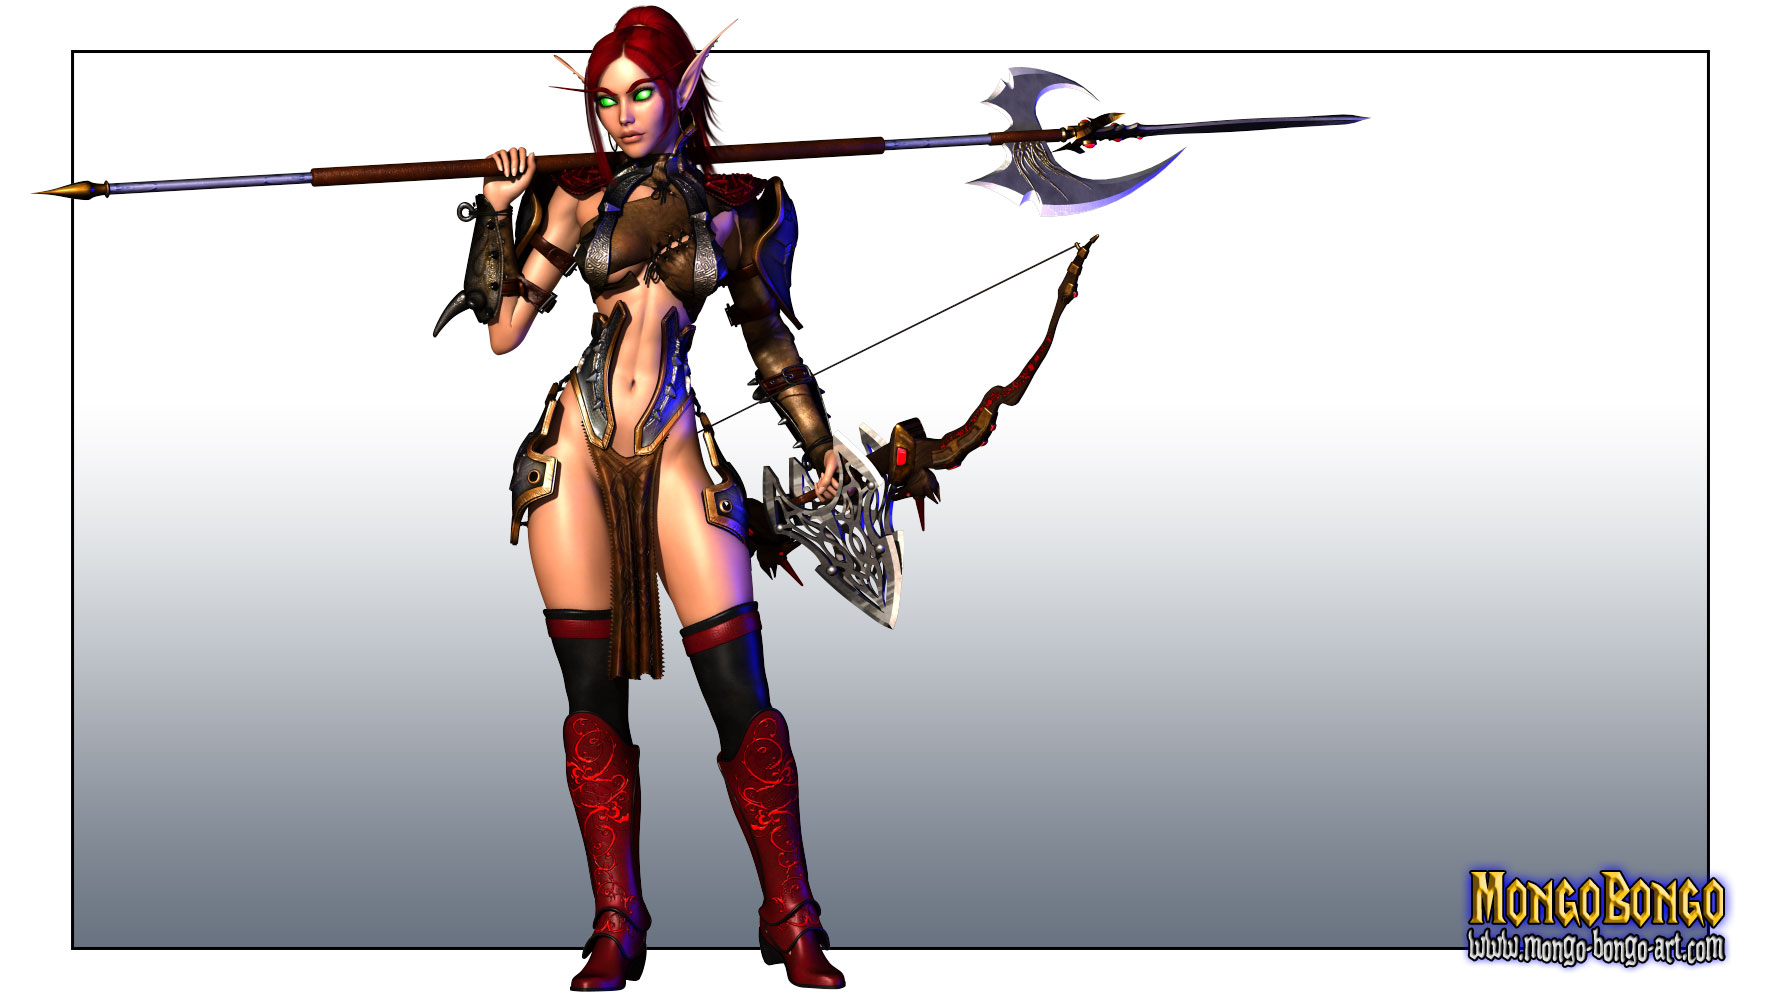 Warcraft Dragon Slayers- Mongo Bongo image 1